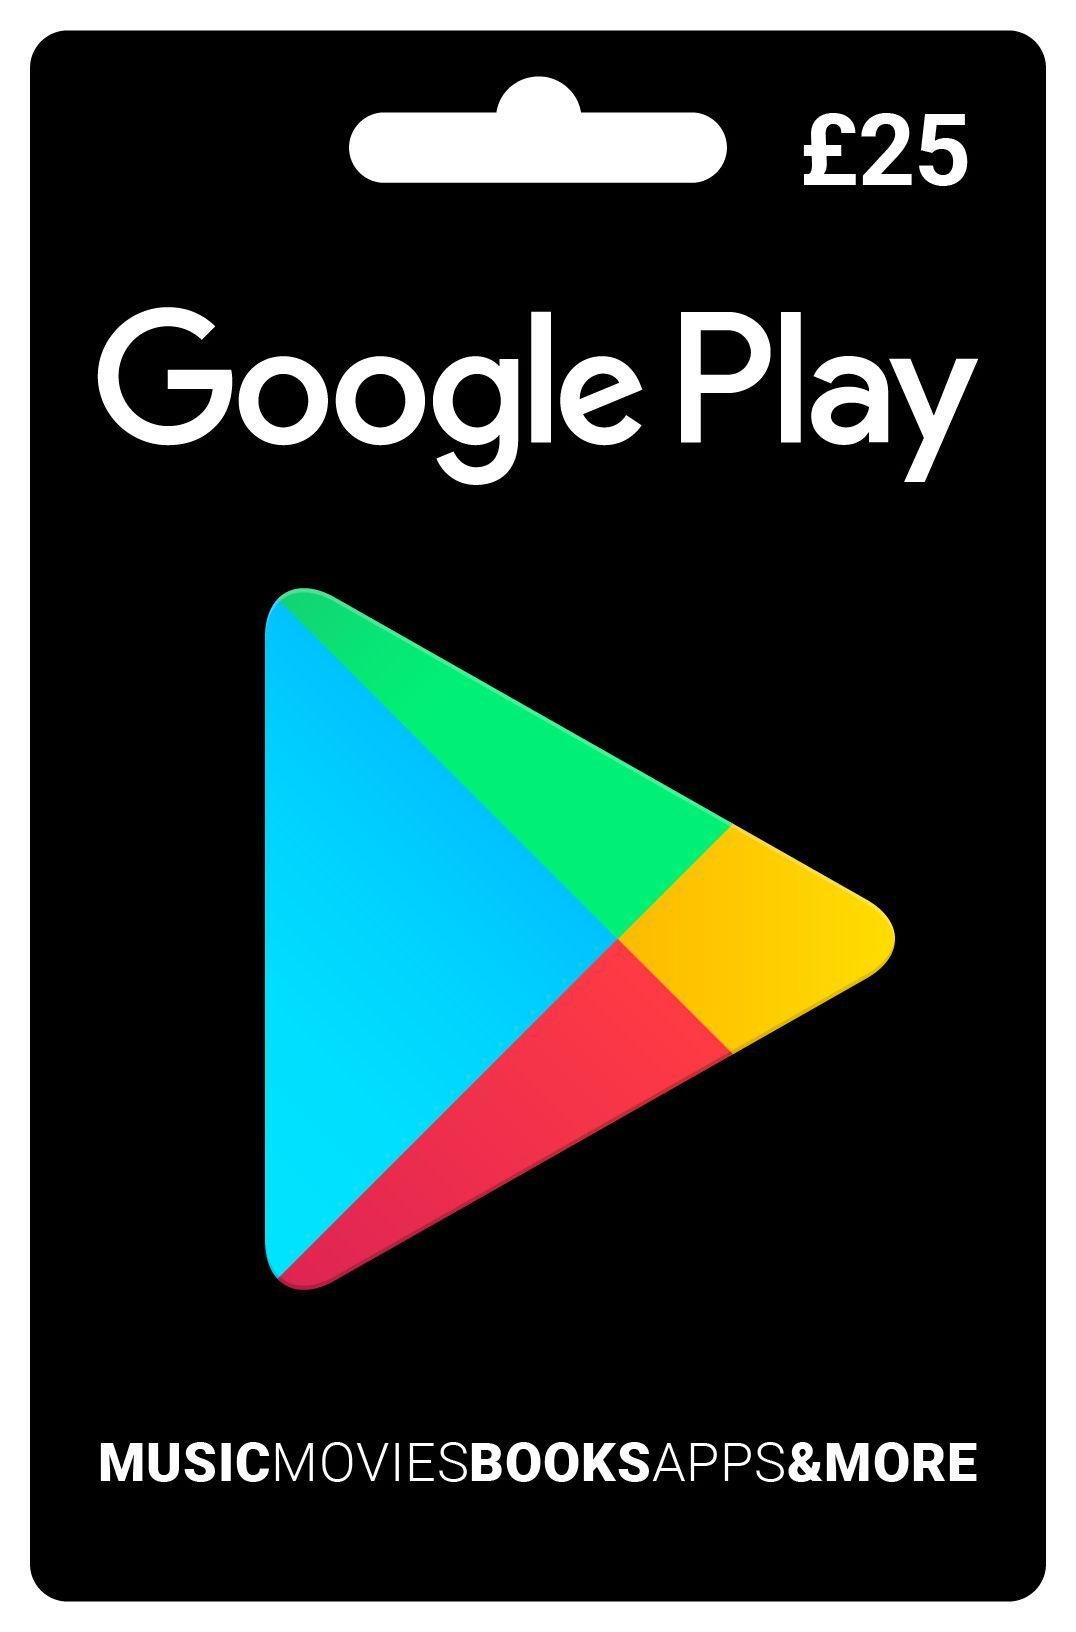 £25 Google Play Voucher. Review thumbnail